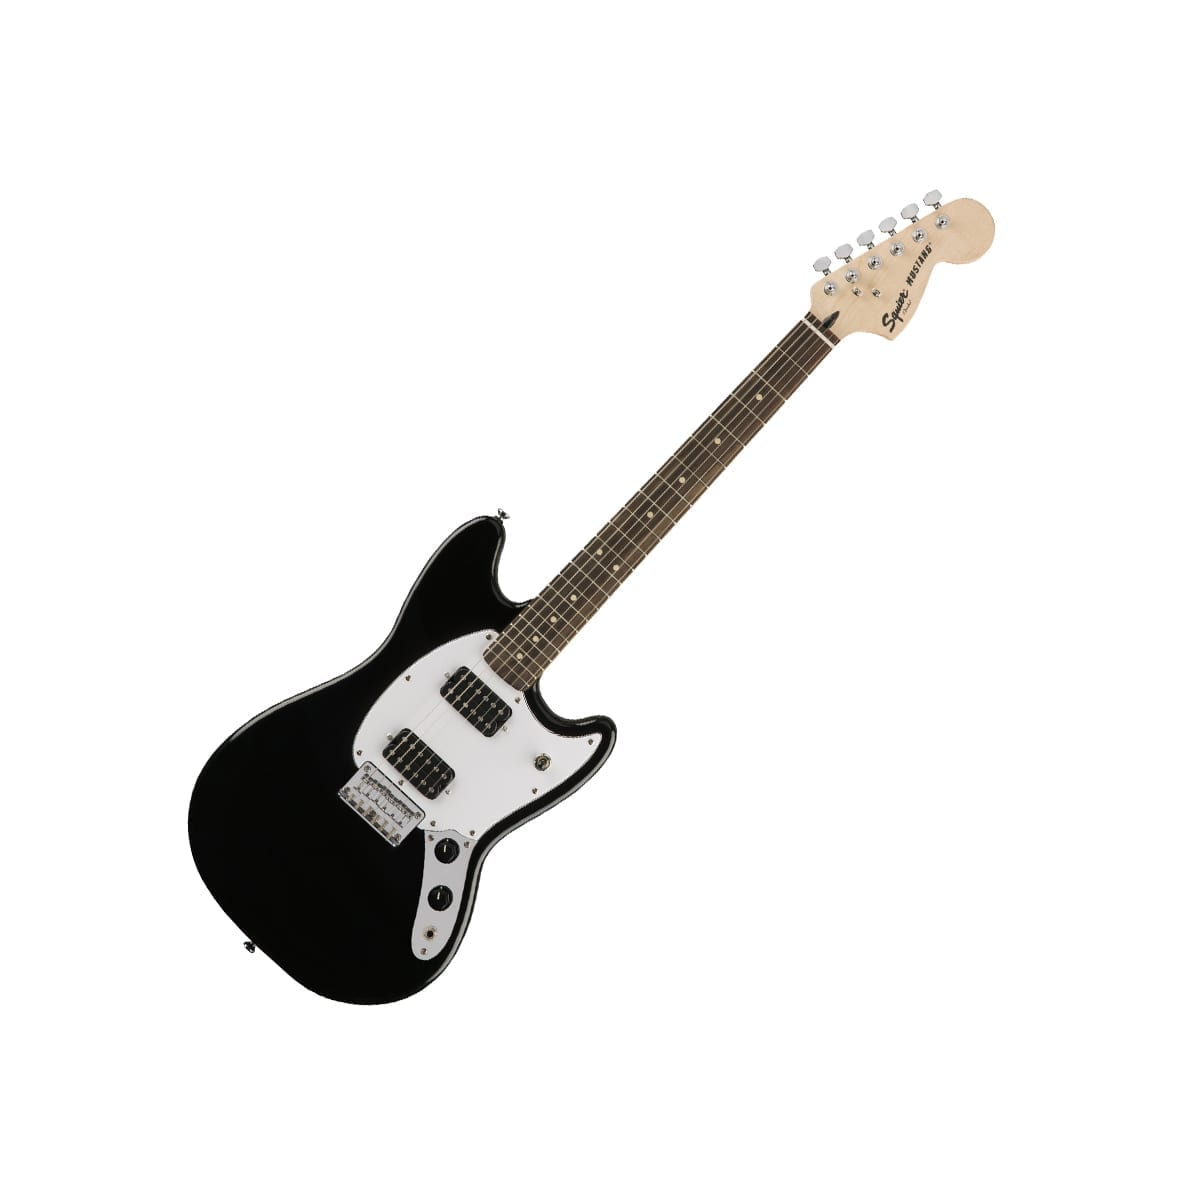 Fender Squire Bullet Mustang - Black